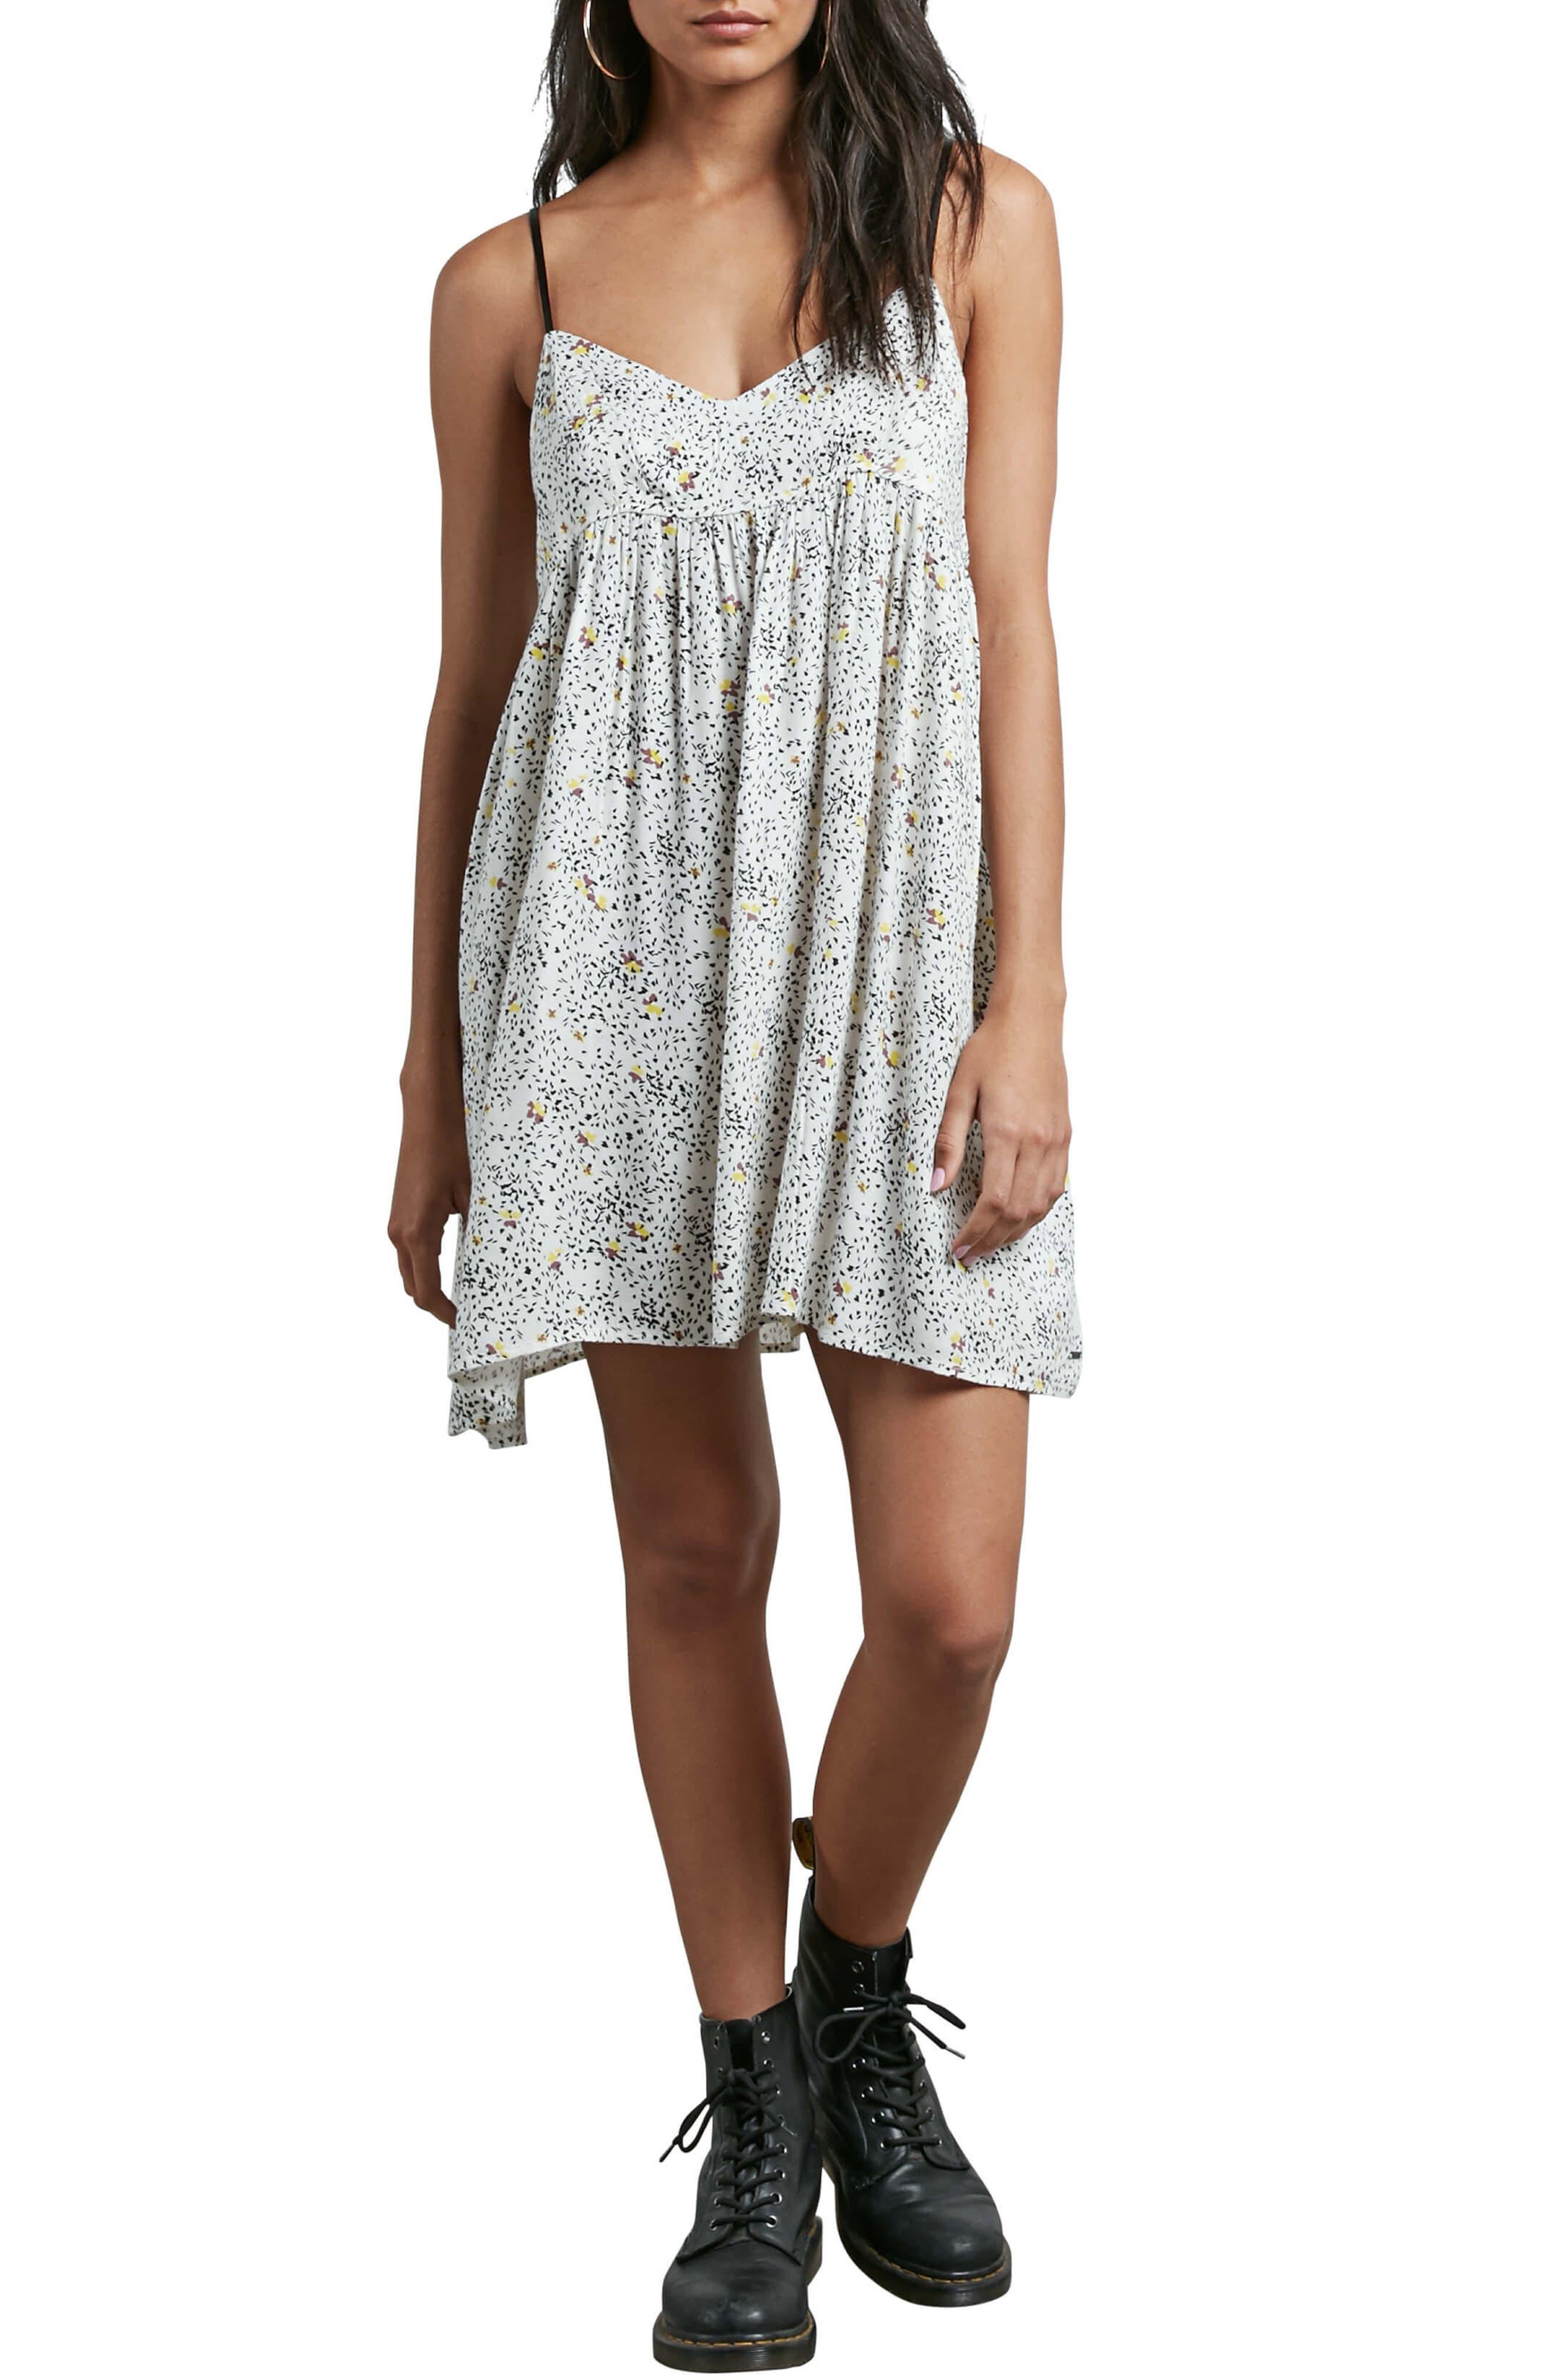 Alternate Image 1 Selected - Volcom Thx It's a New Dress Babydoll Dress